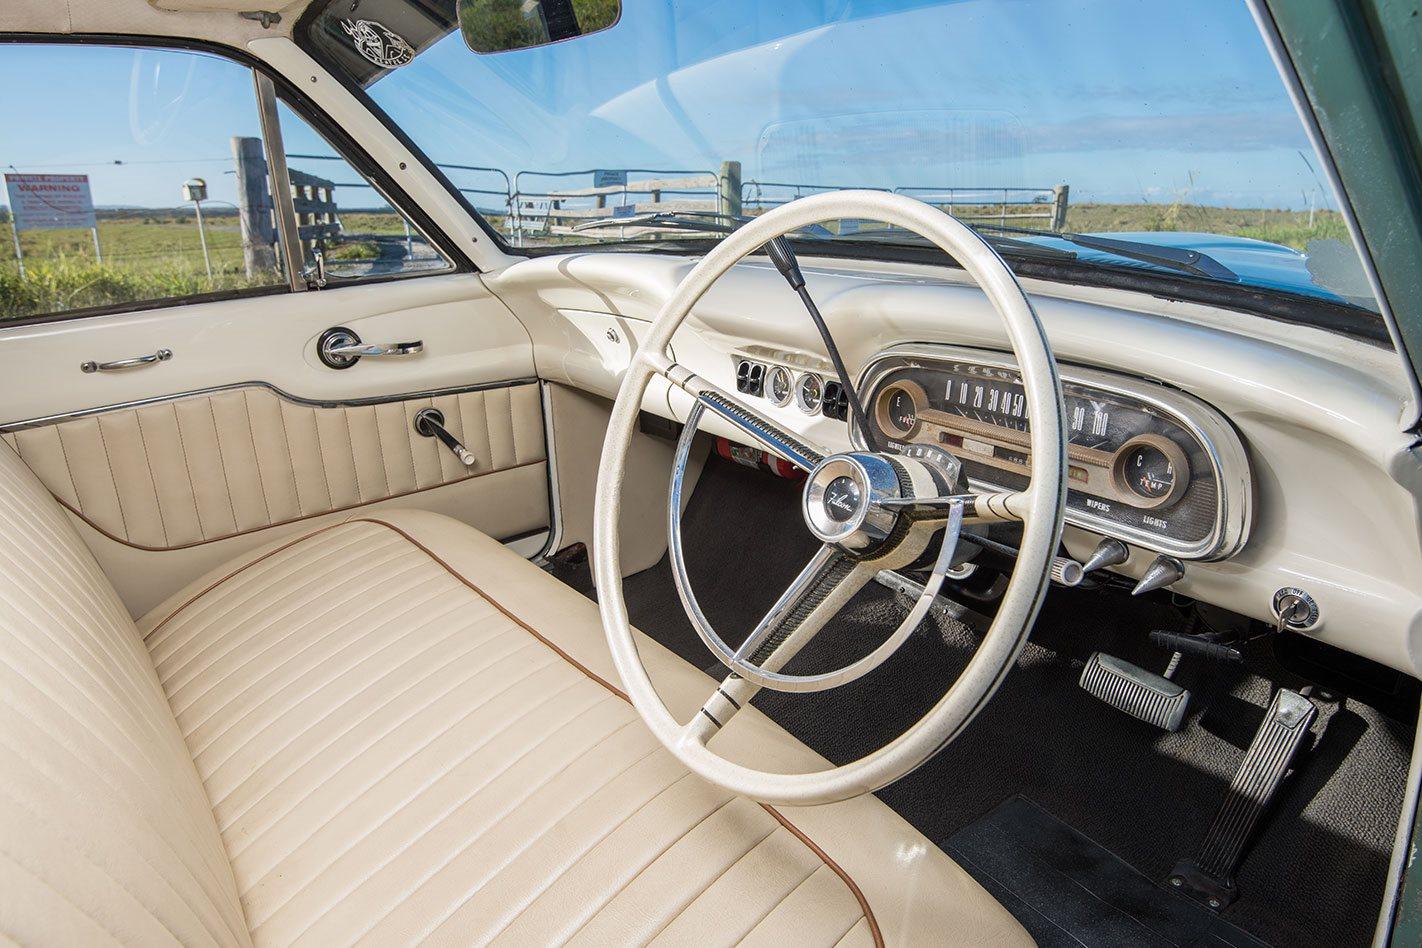 Slammed Ford Xl Falcon Wagon Reader S Car Of The Week